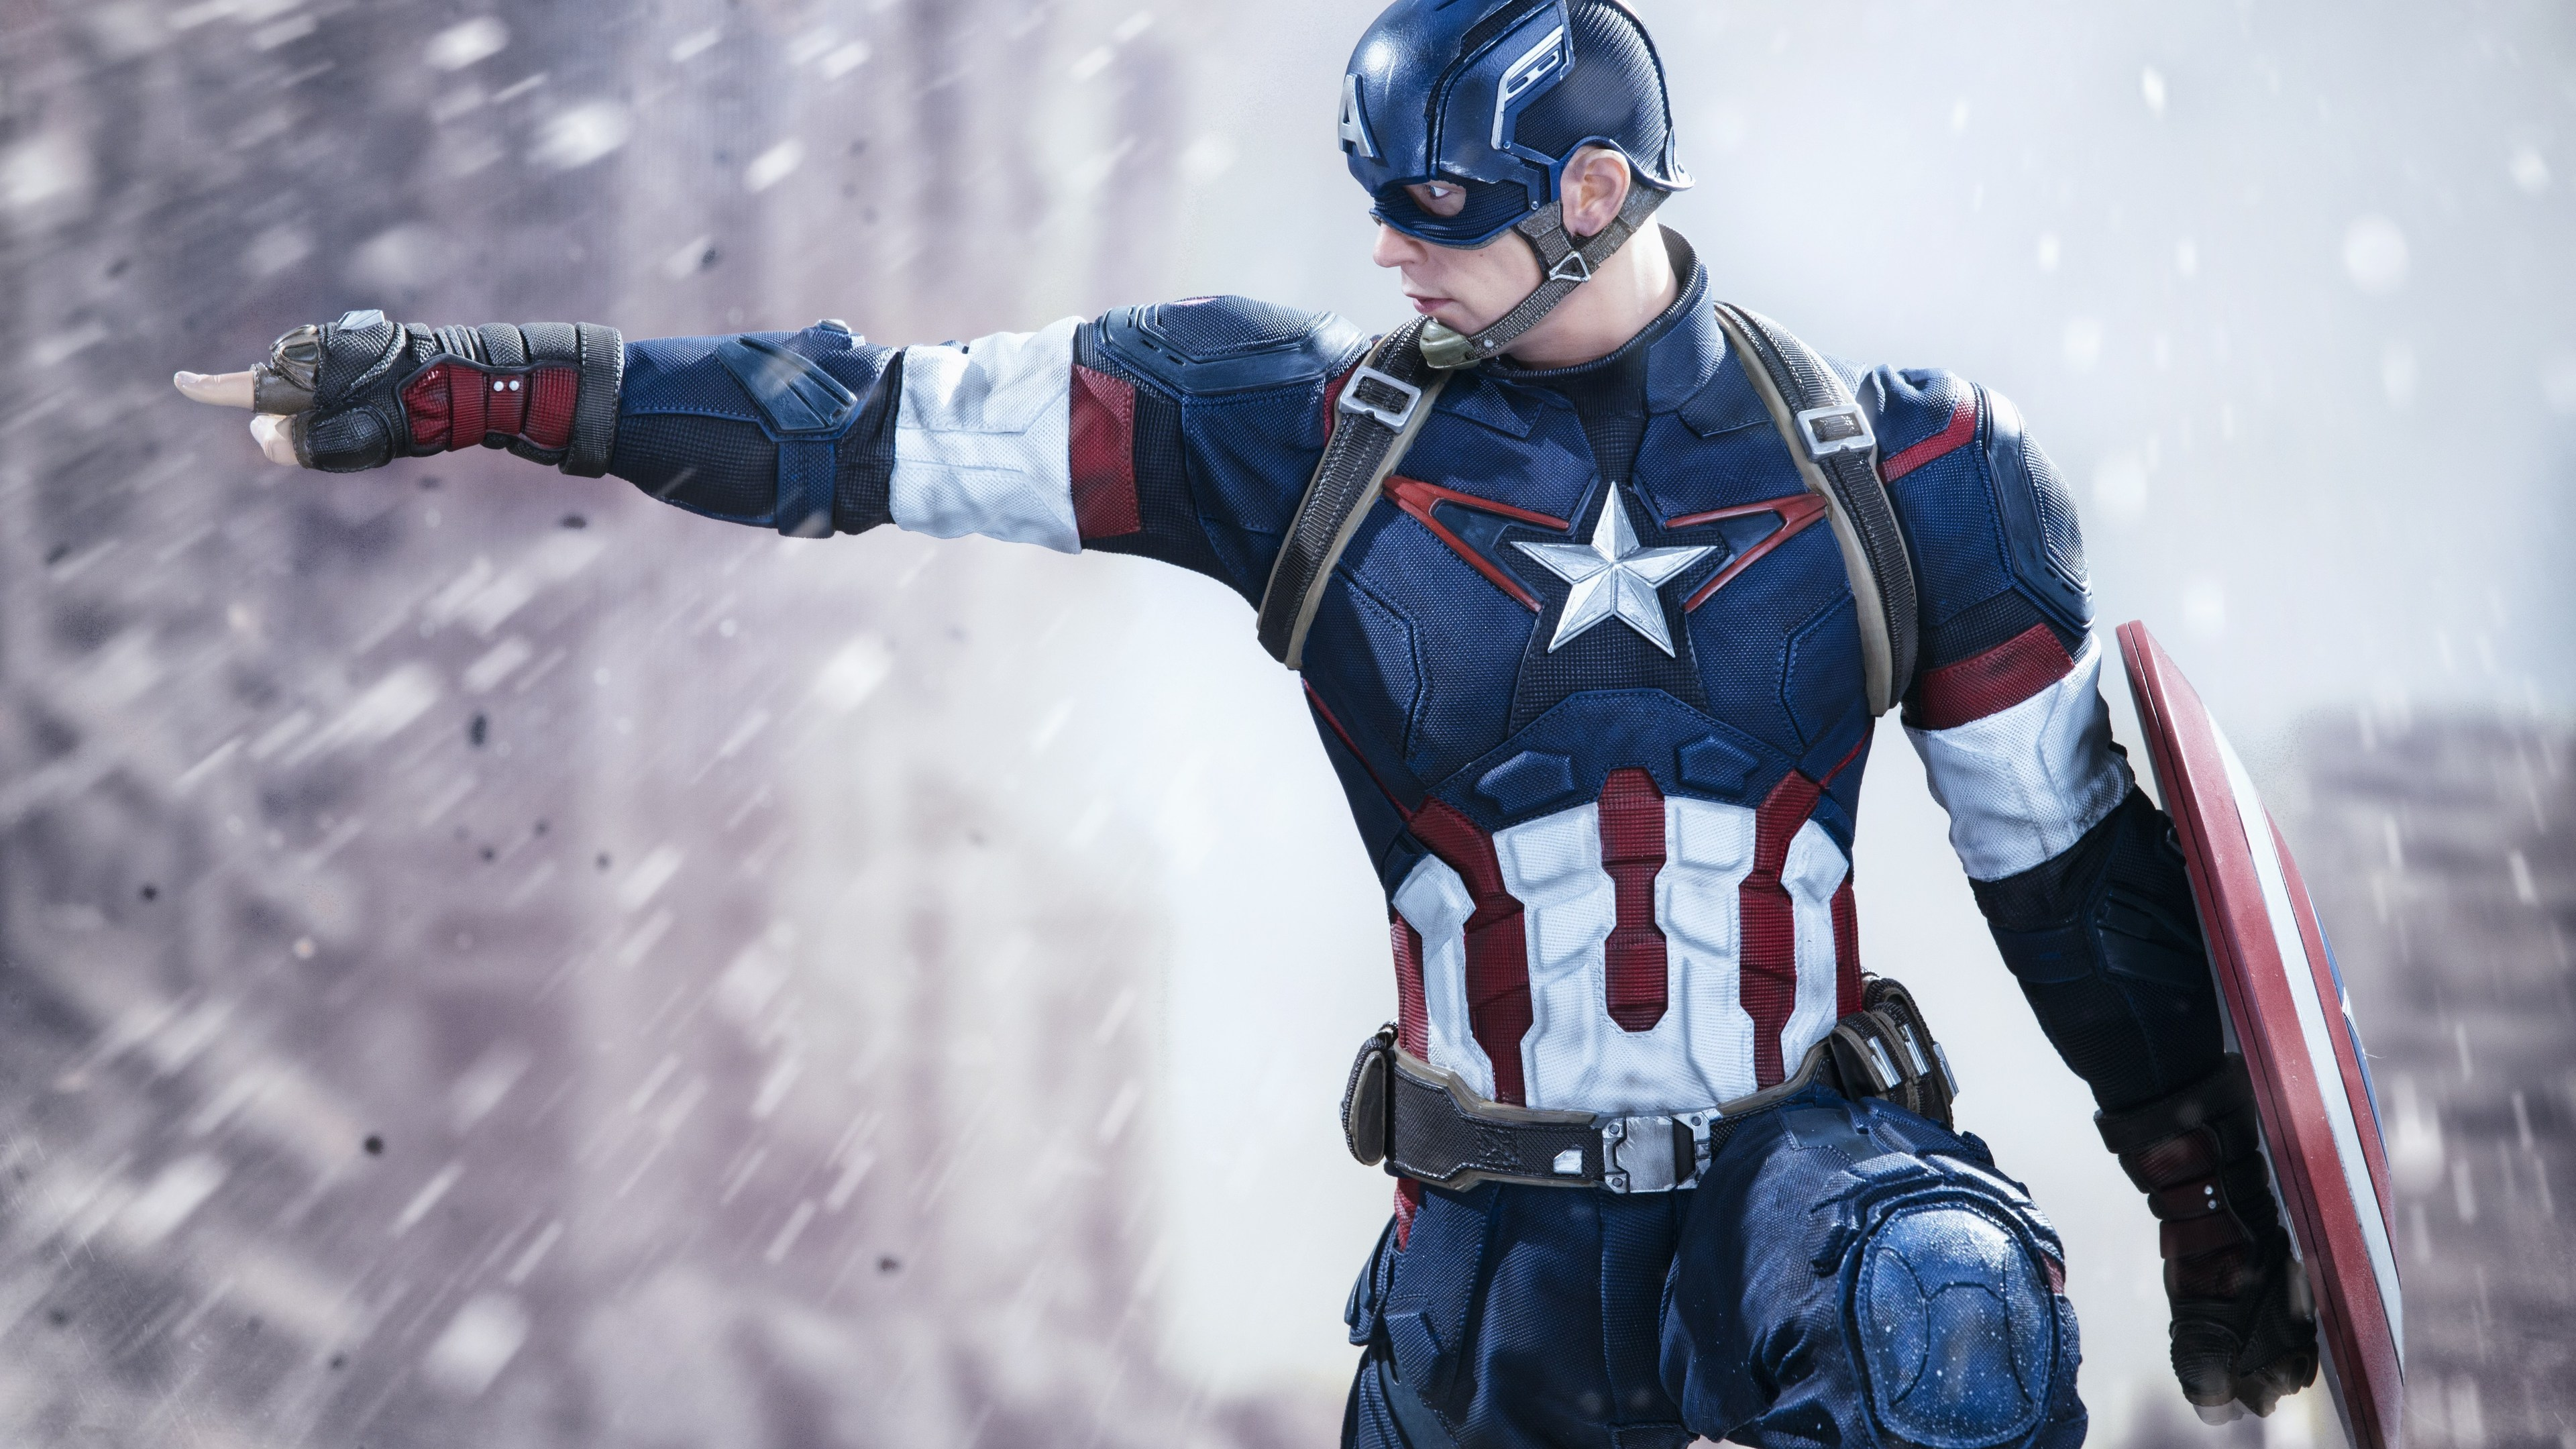 captain america civil war new 4k 1550511866 - Captain America Civil War New 4k - superheroes wallpapers, hd-wallpapers, captain america wallpapers, artwork wallpapers, 5k wallpapers, 4k-wallpapers